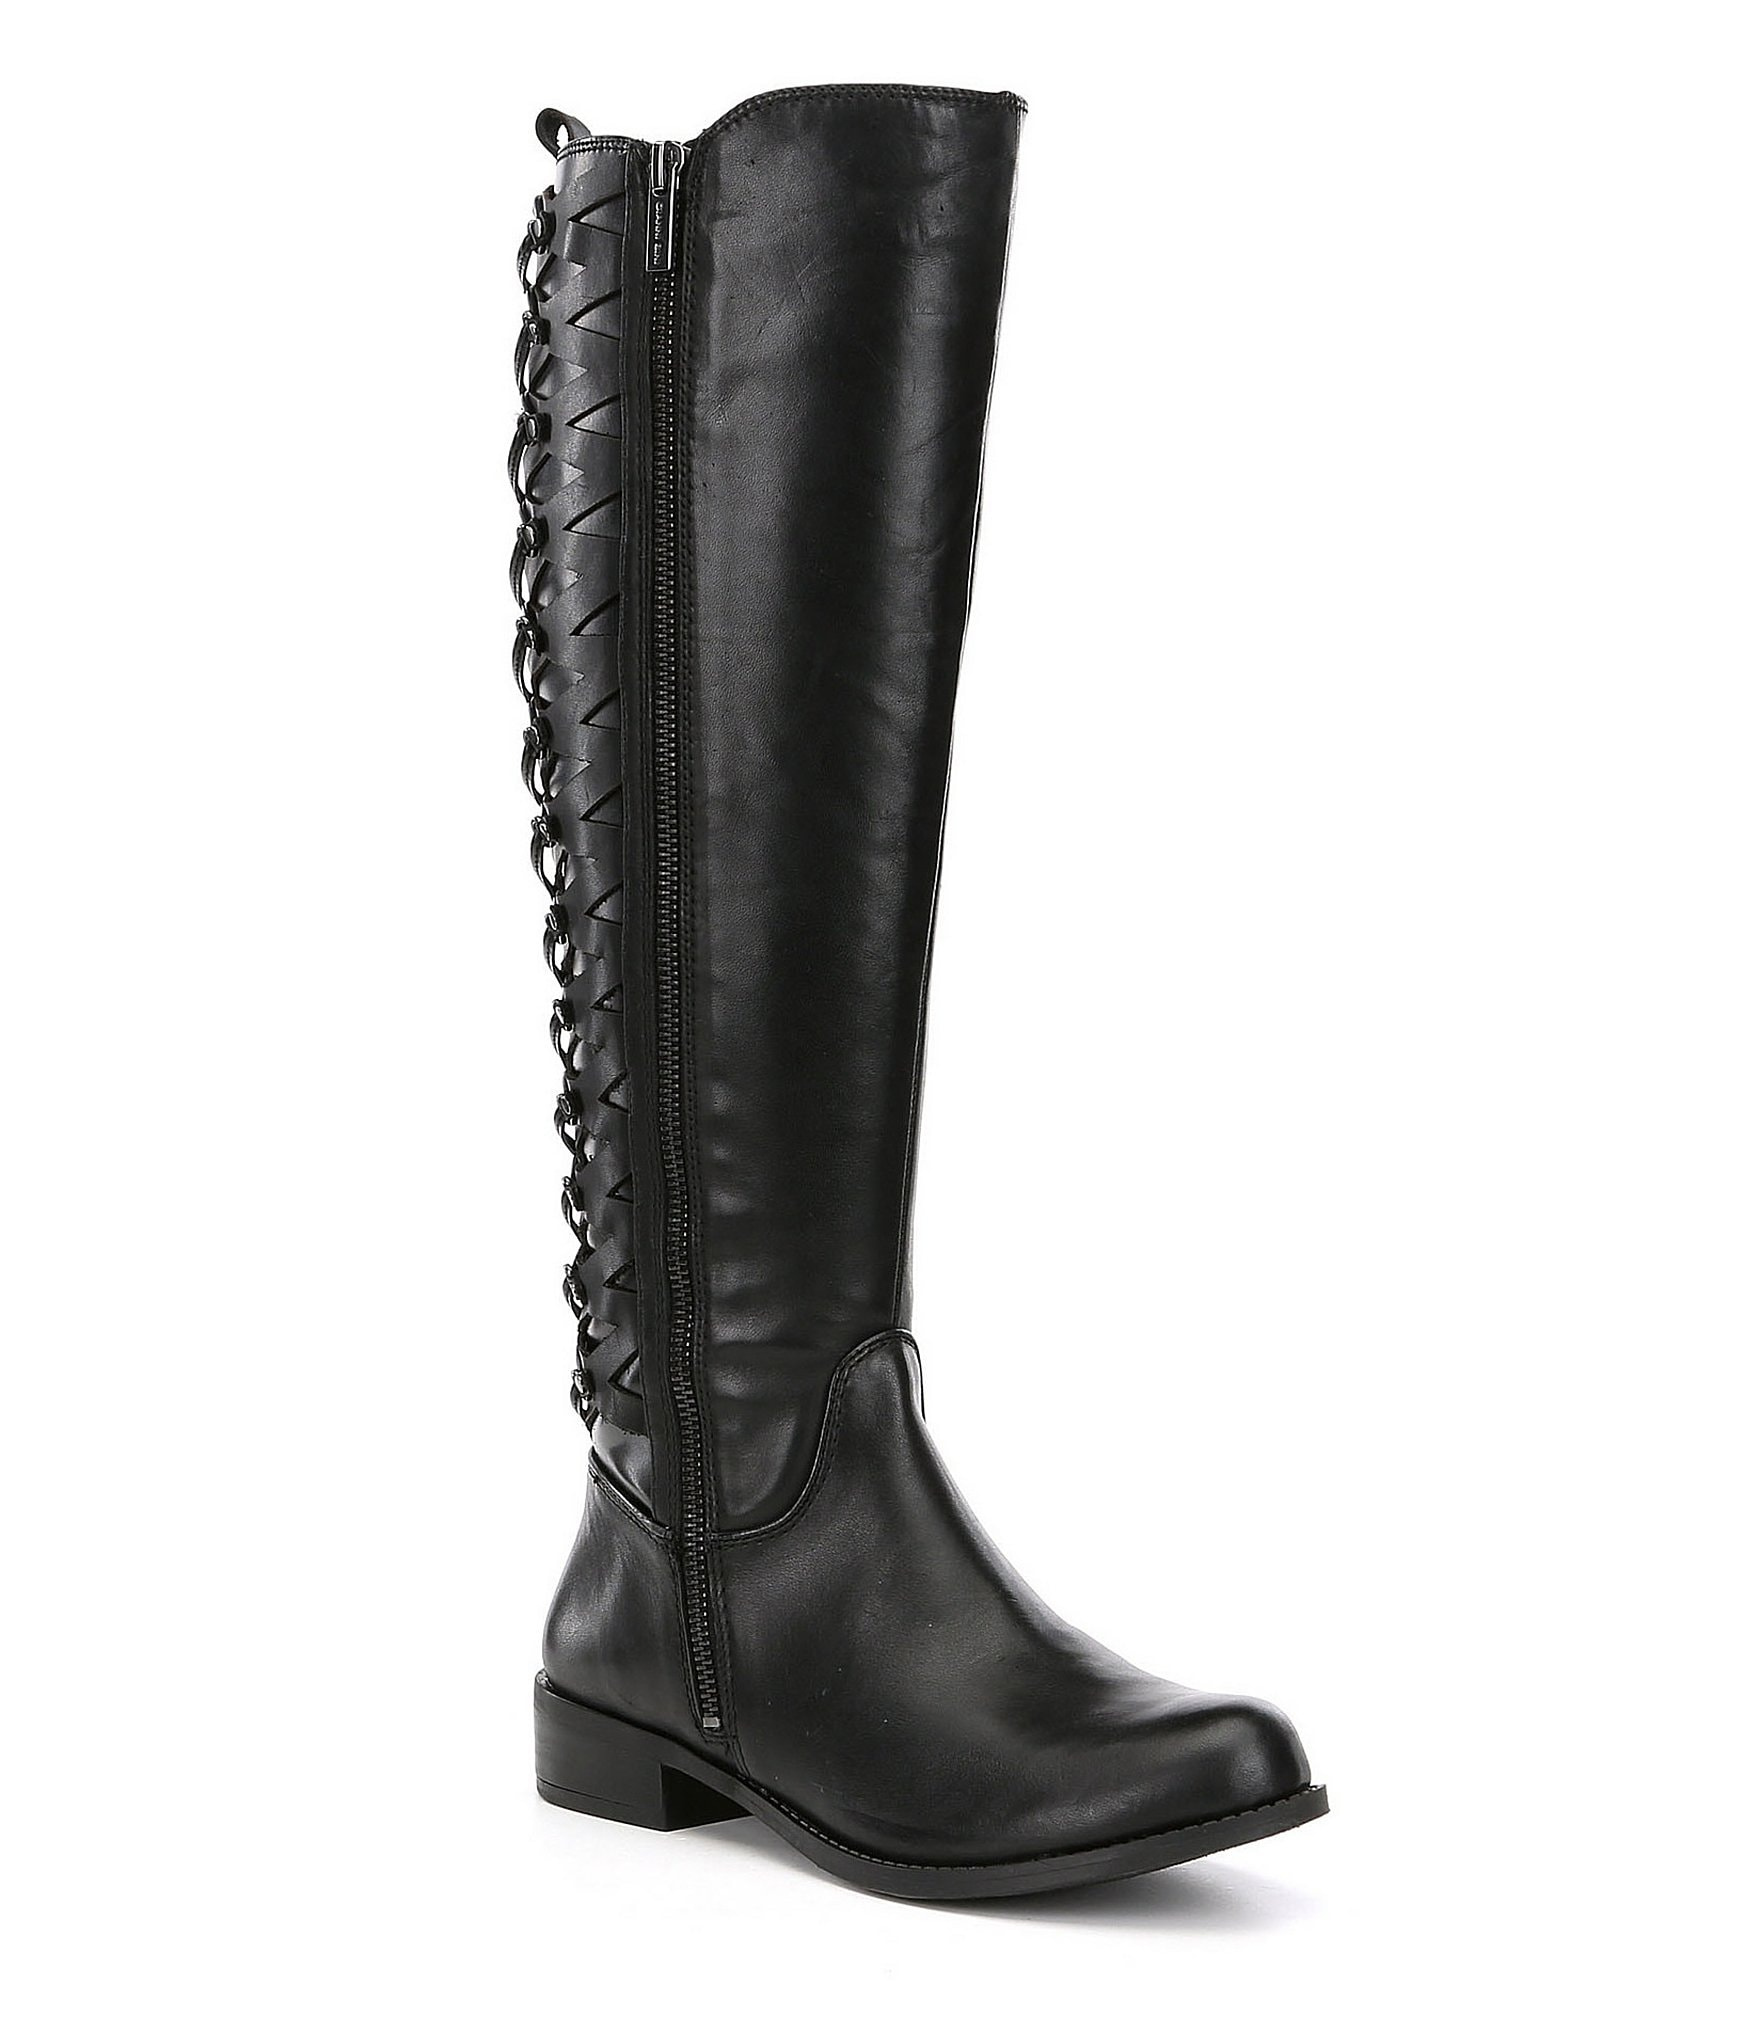 gianni bini picard wide calf leather lattice back detail